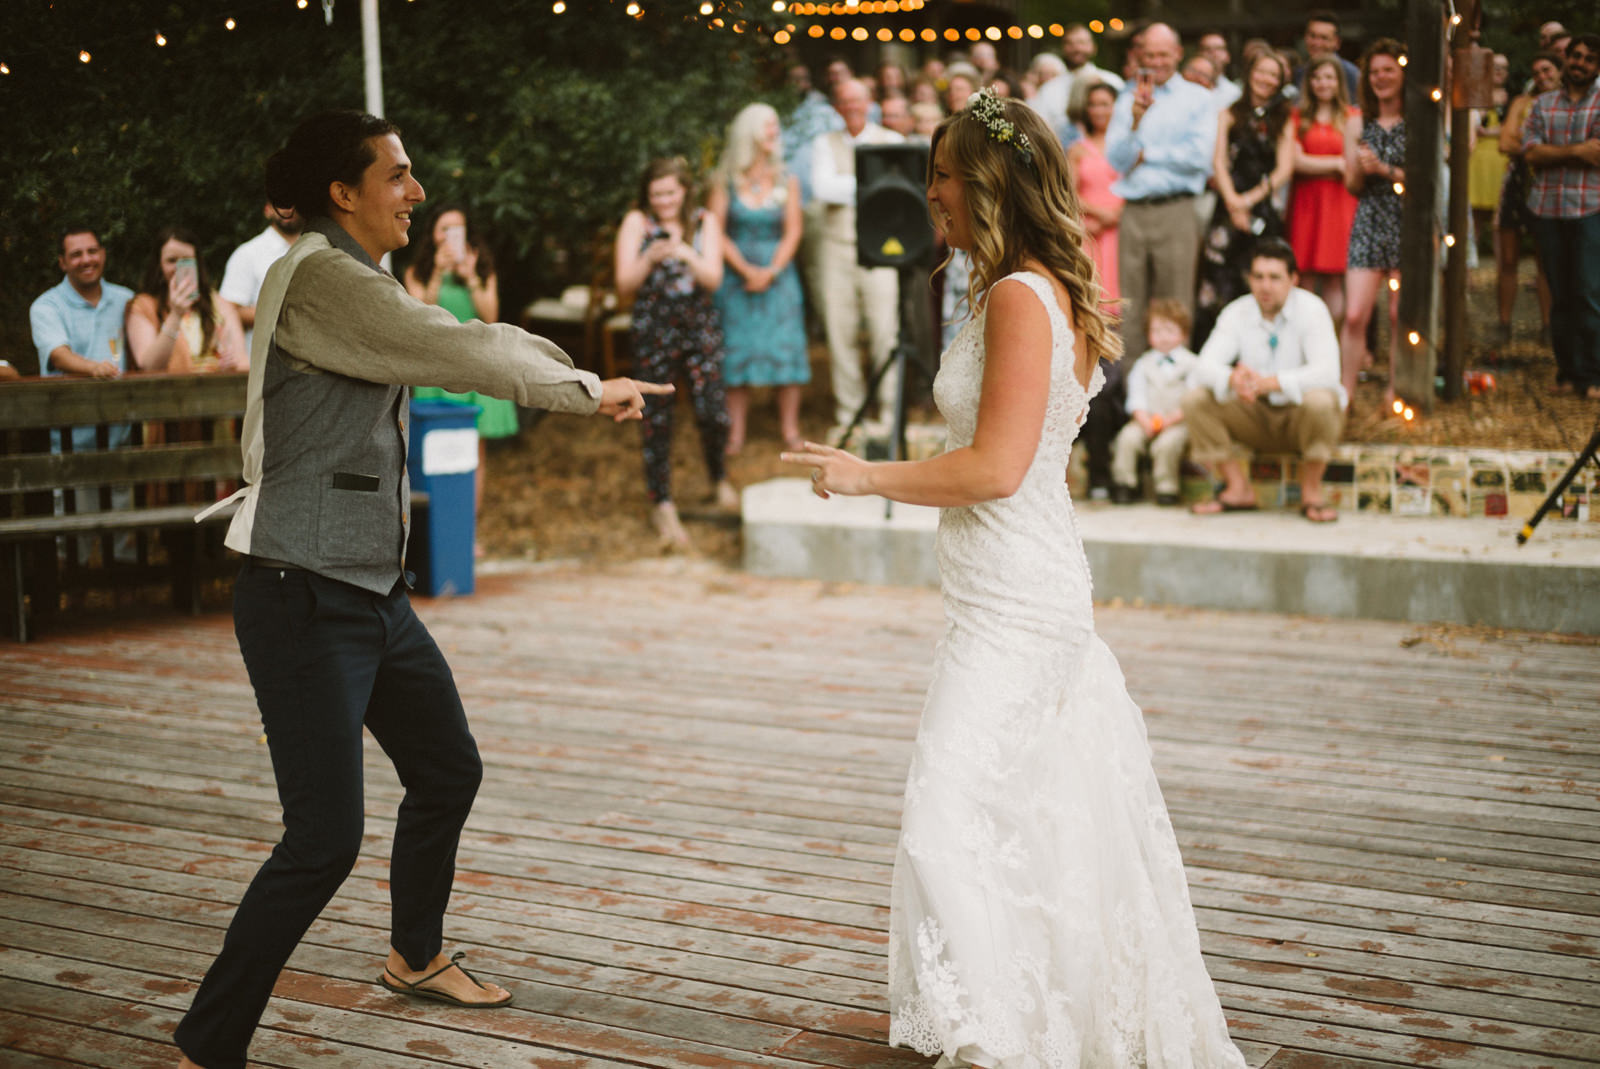 rivers-bend-retreat-wedding-095 RIVER'S BEND RETREAT WEDDING